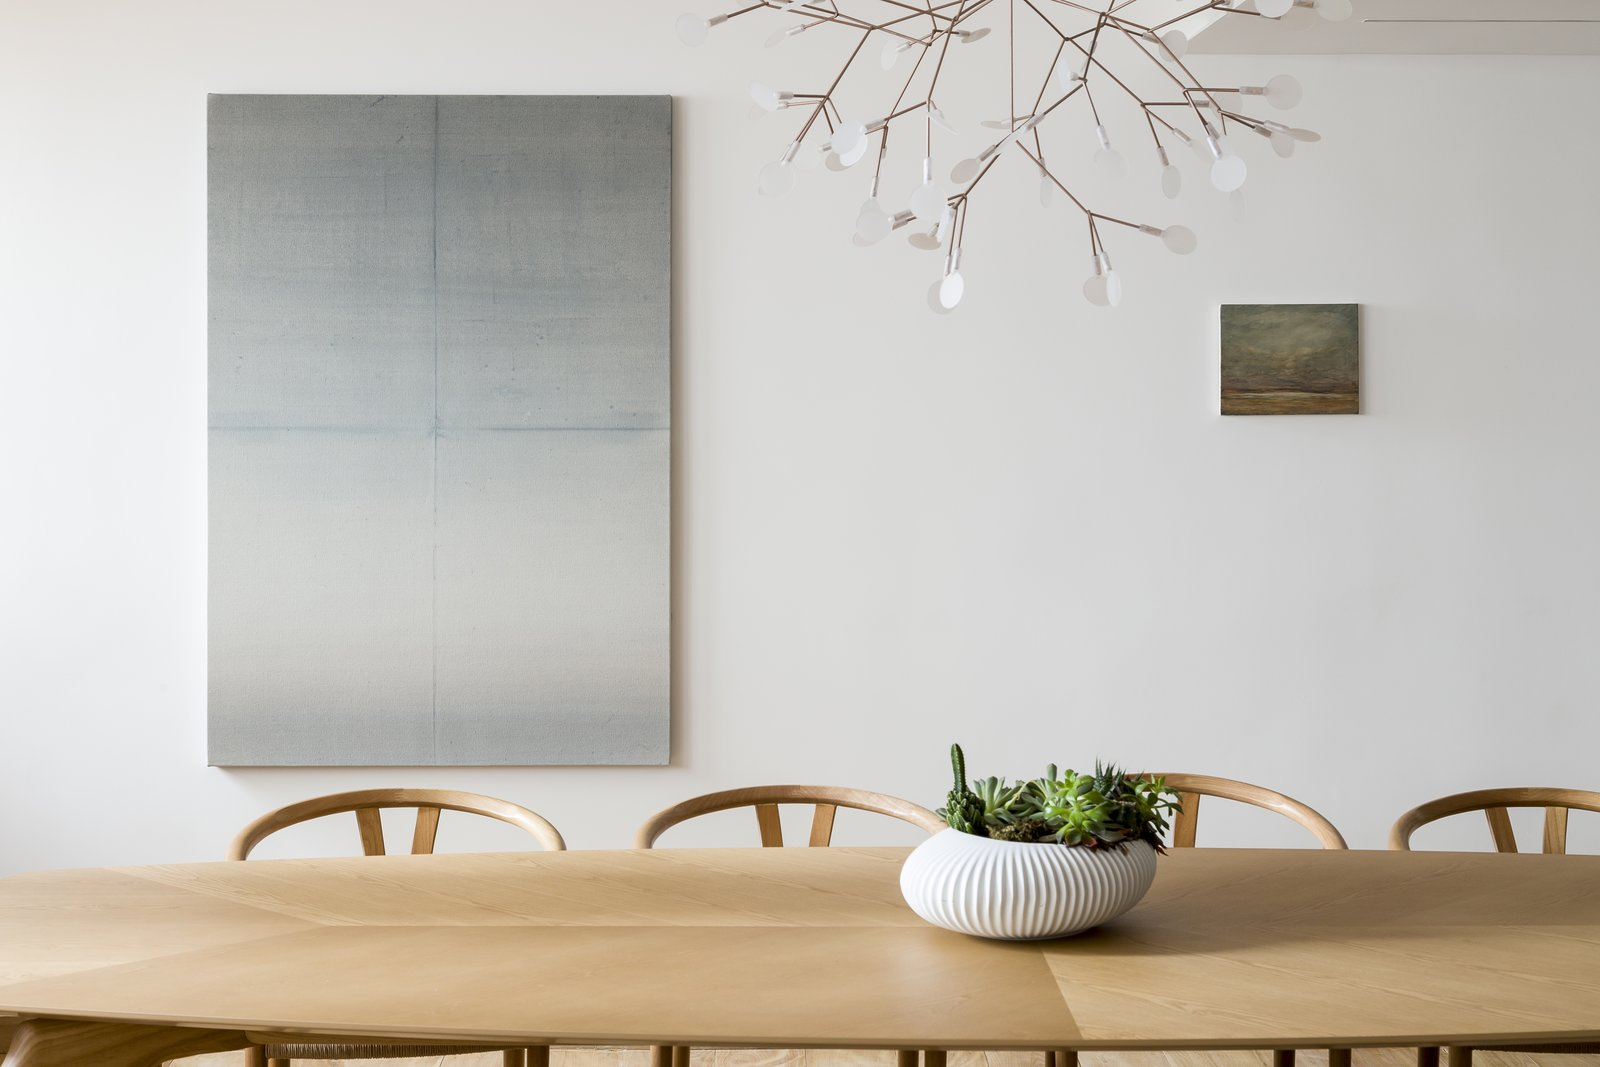 Apartment VLP dining table with Bertjan Pot lamp